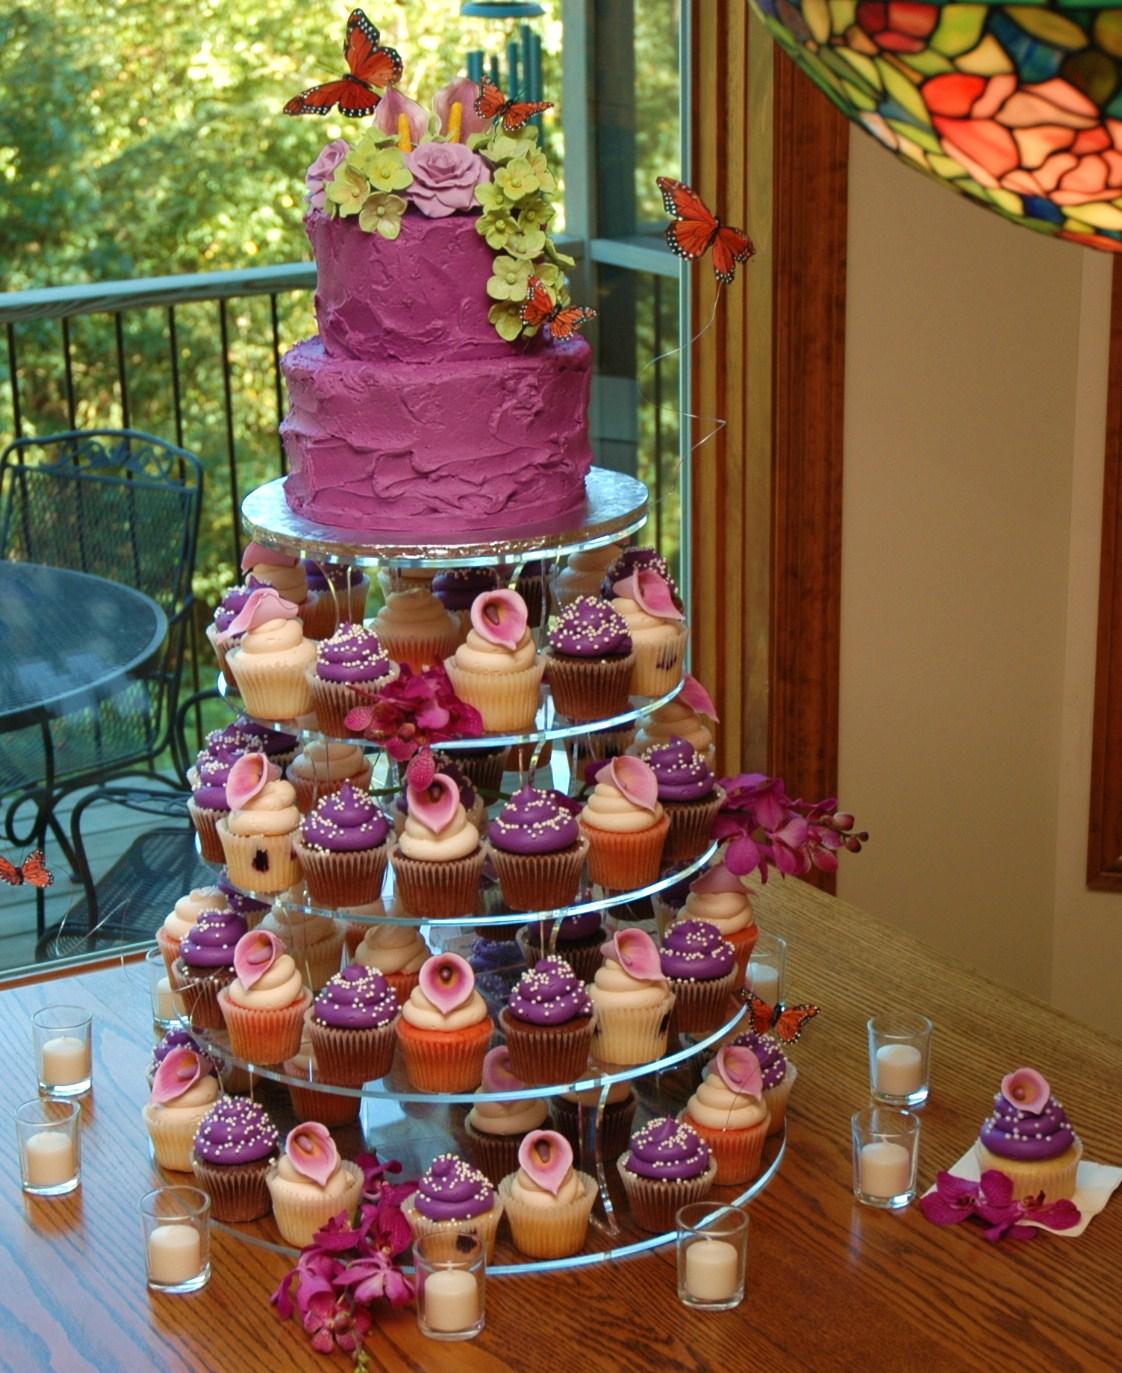 Wedding Cupcake Tower: Tara's Cupcakes: Sangria Butterfly Wedding Cupcake Tower